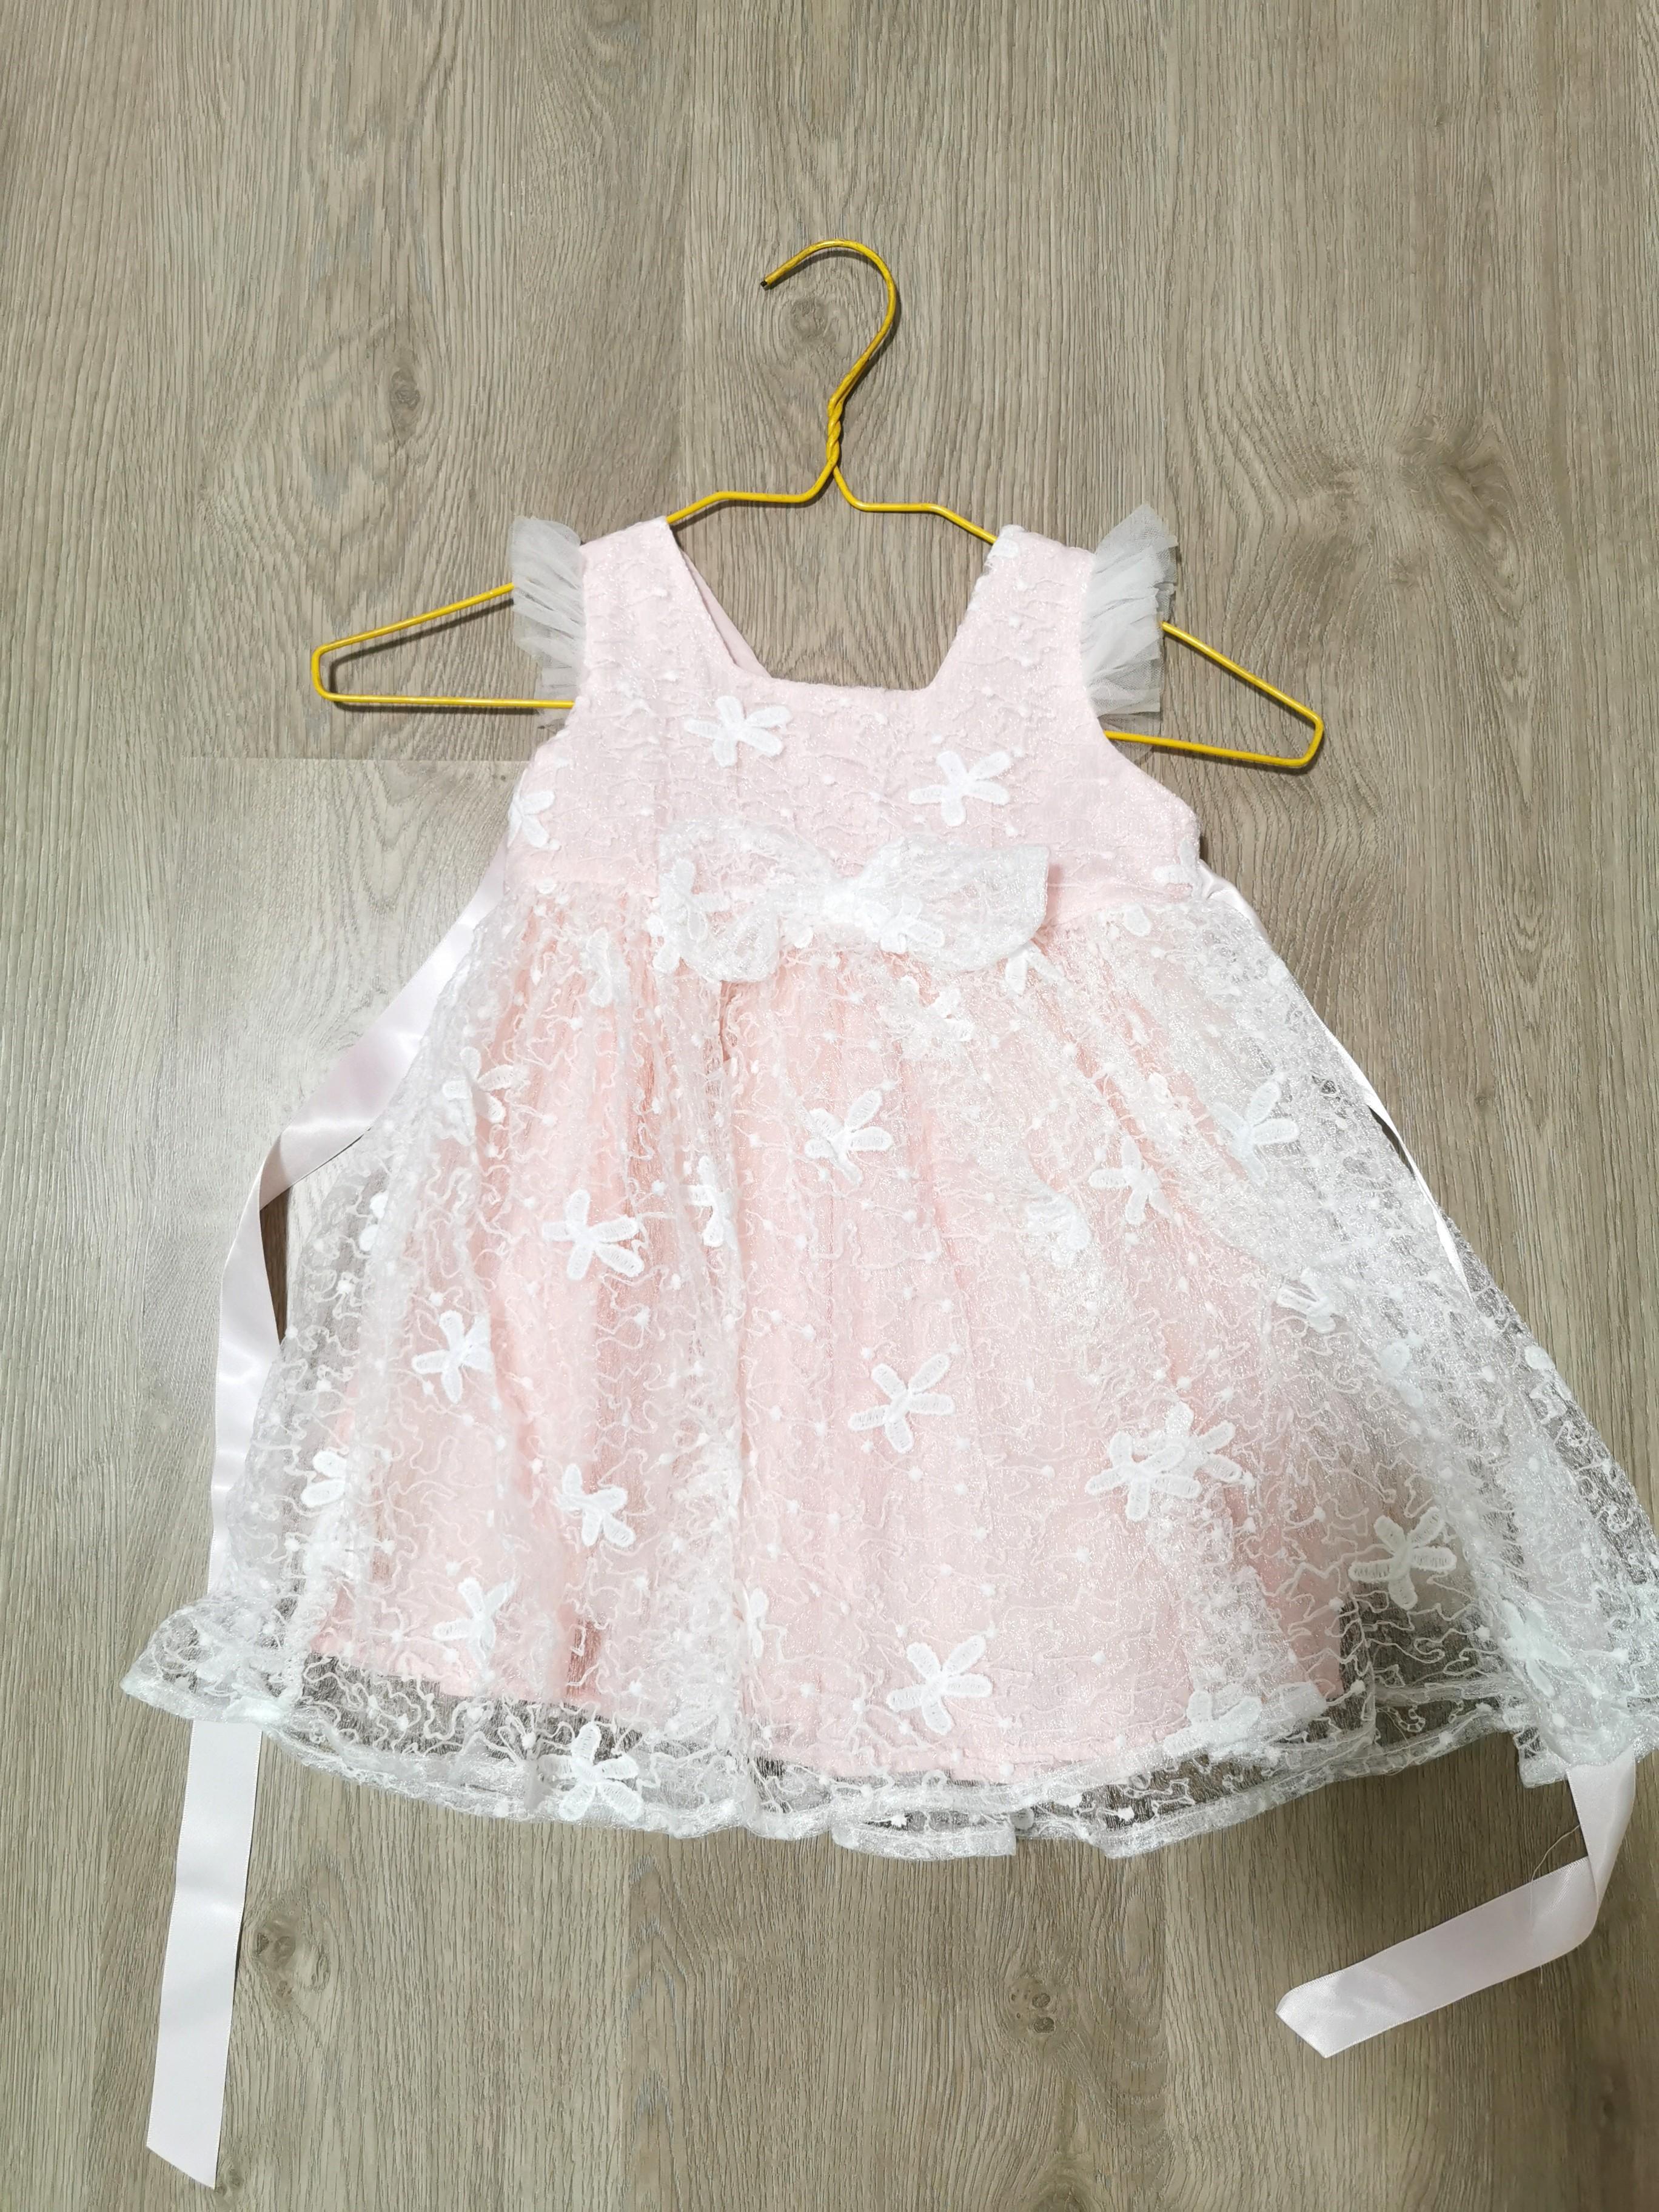 Baby Girl Dress (used)